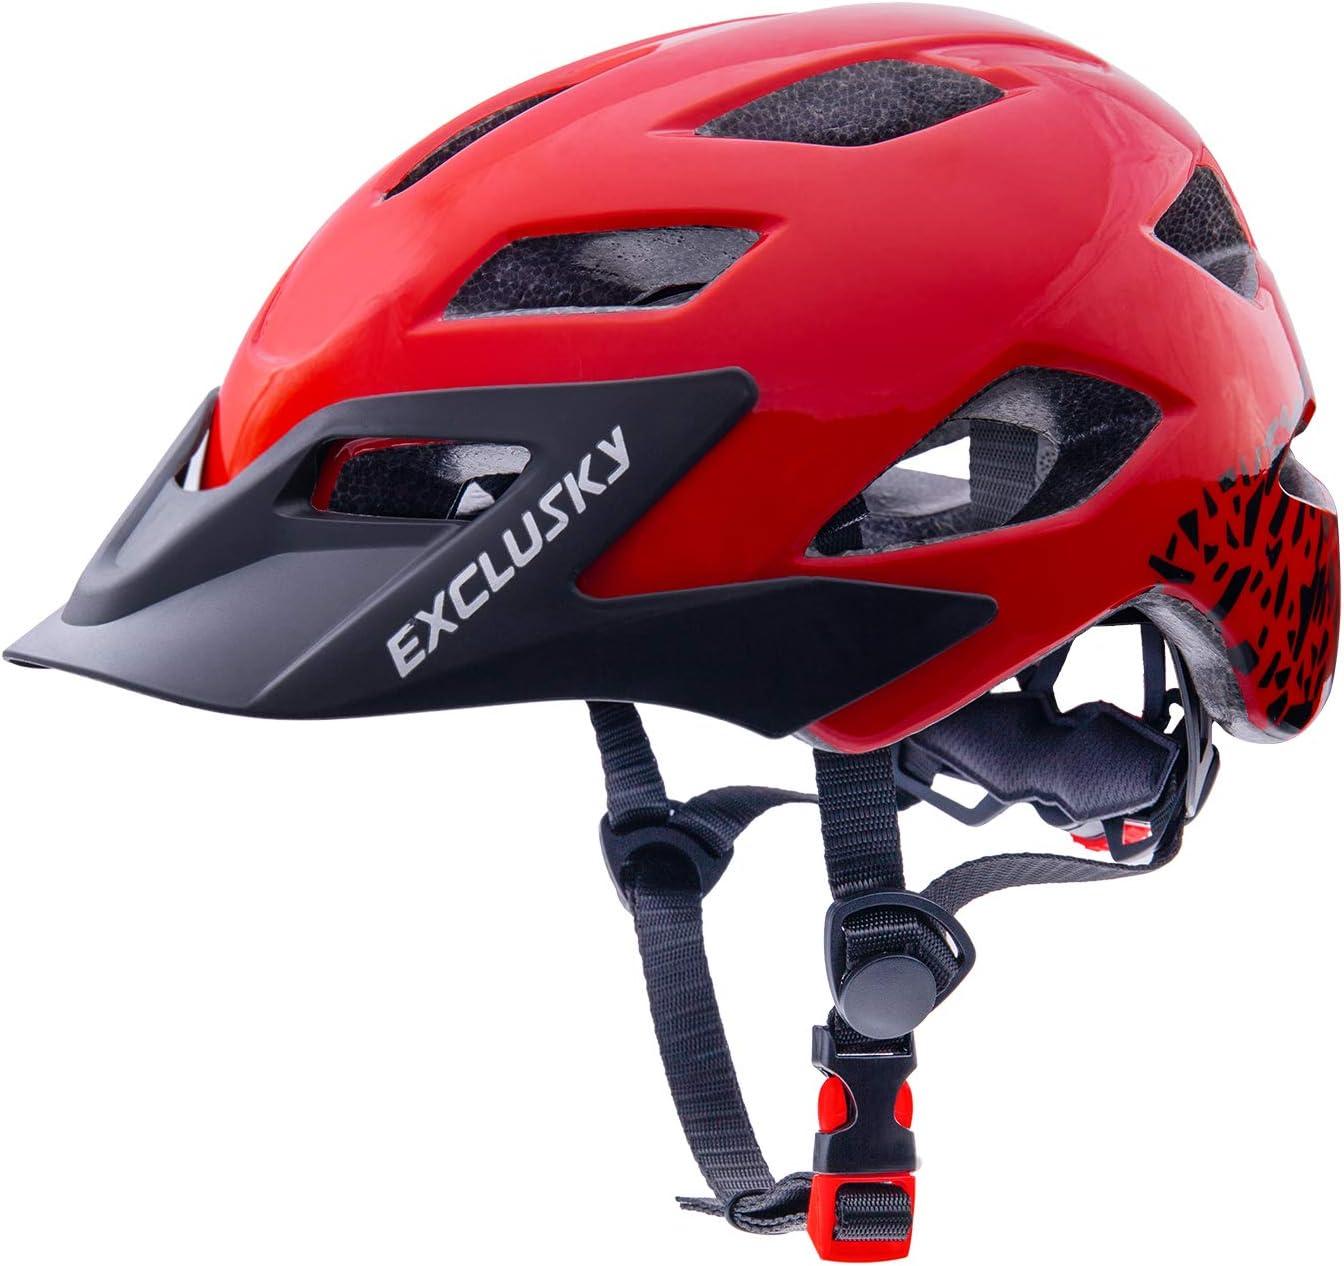 Exclusky Kids Bike Helmet, Lightweight Youth Roller Skate Helmet, Size Adjustable Child Bicycle Cycling Helmets for Boys Girls Scooter, 50-57cm(Ages 5-14)